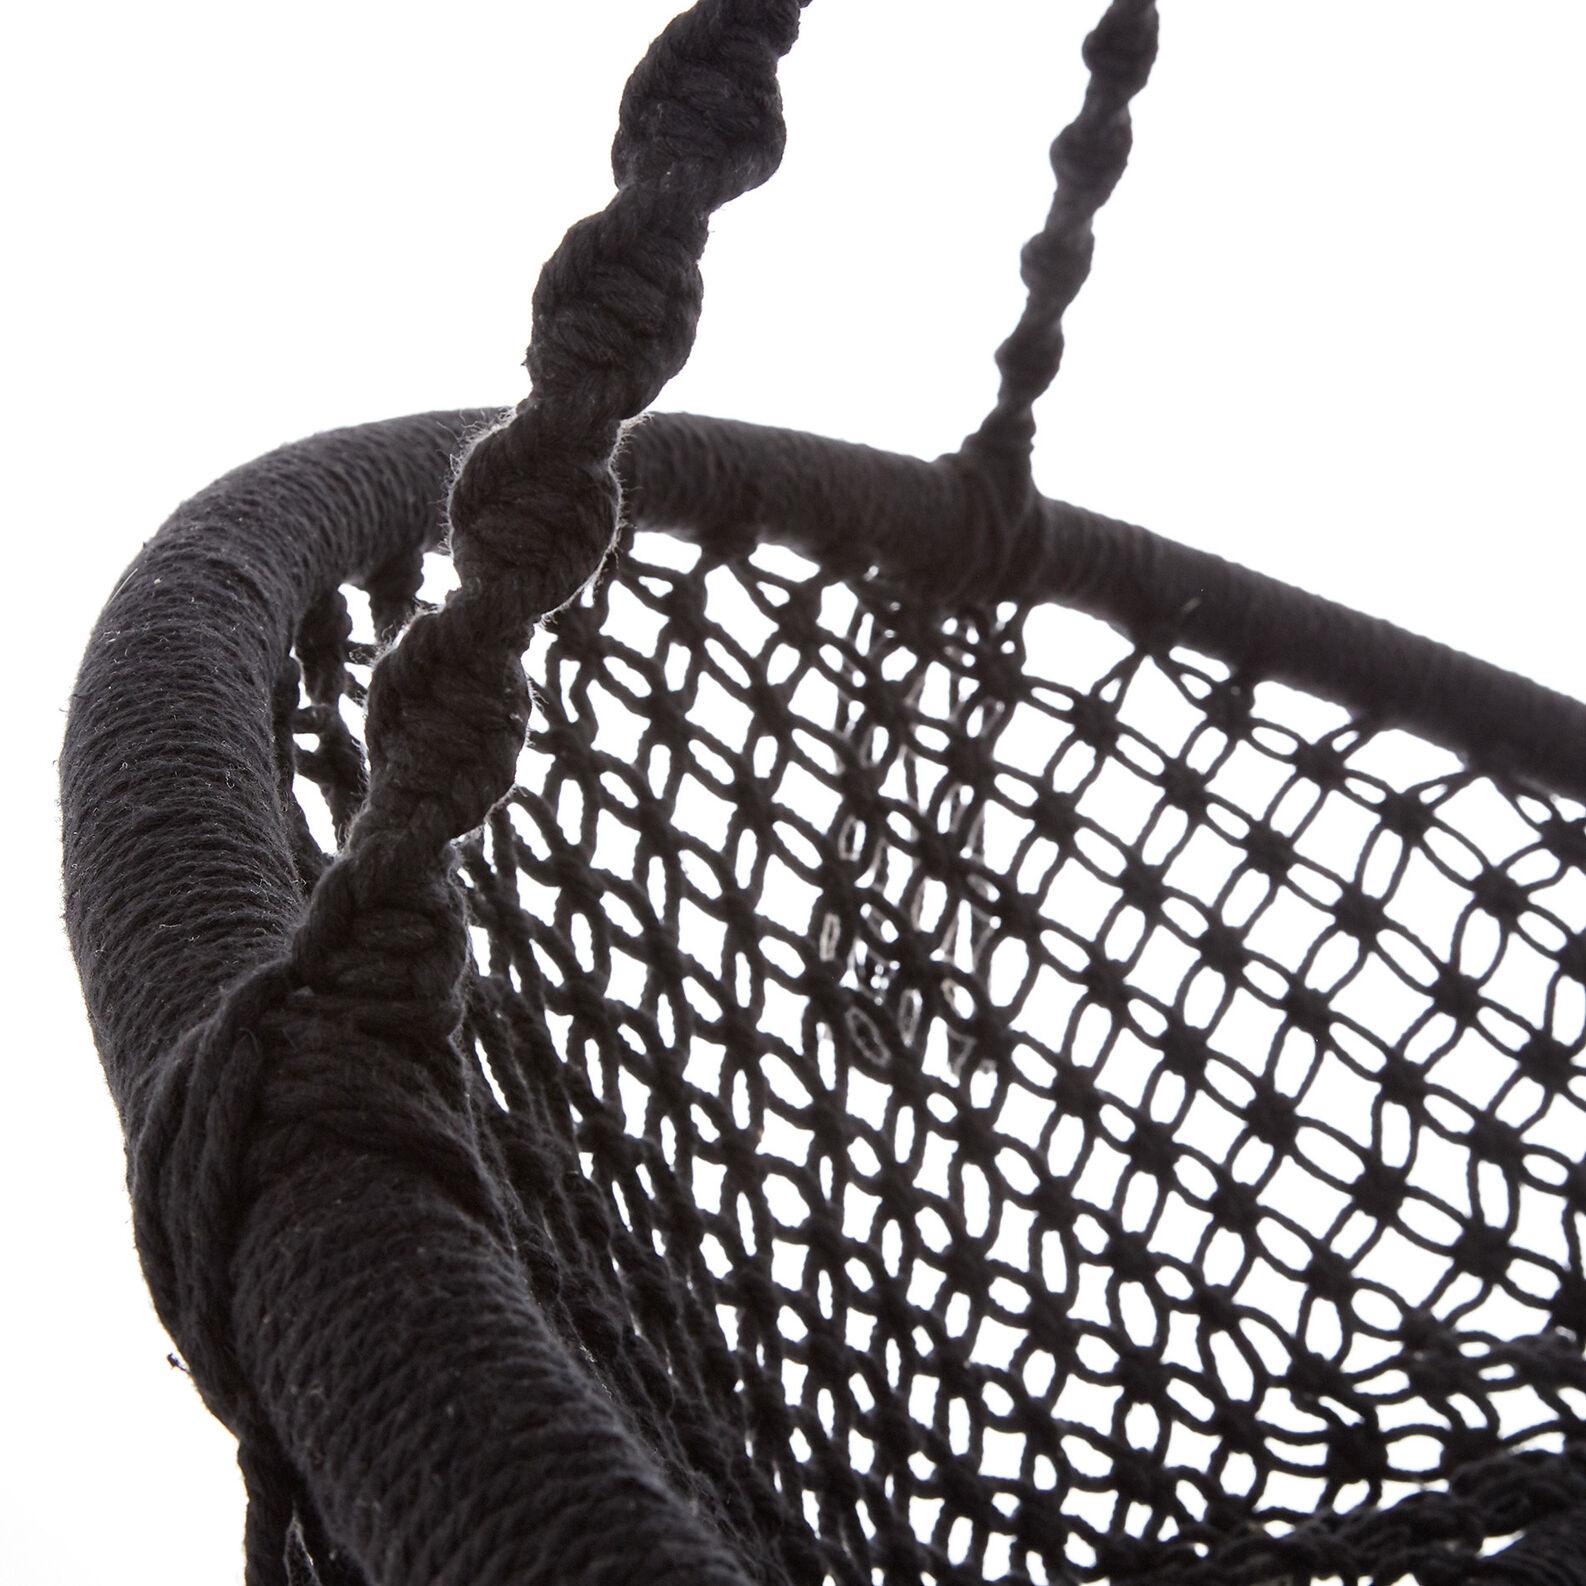 Amaca in corda di cotone con frange tinta unita